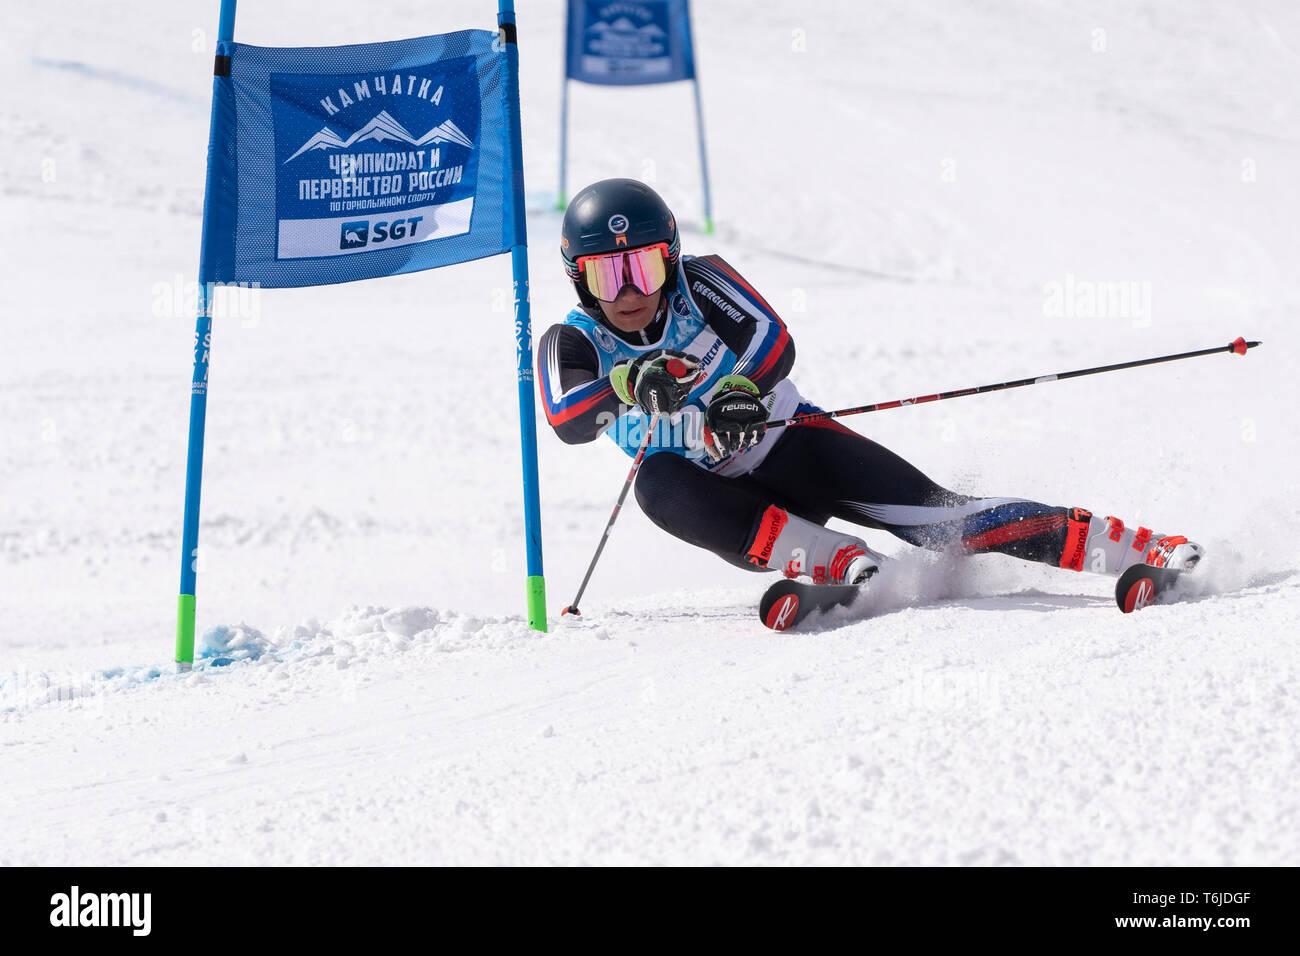 KAMCHATKA PENINSULA, RUSSIA - APRIL 1, 2019: Mountain skier Svitkov Gennady (Kamchatka) skiing down mountain slope. Russian Alpine Skiing Cup, Interna Stock Photo